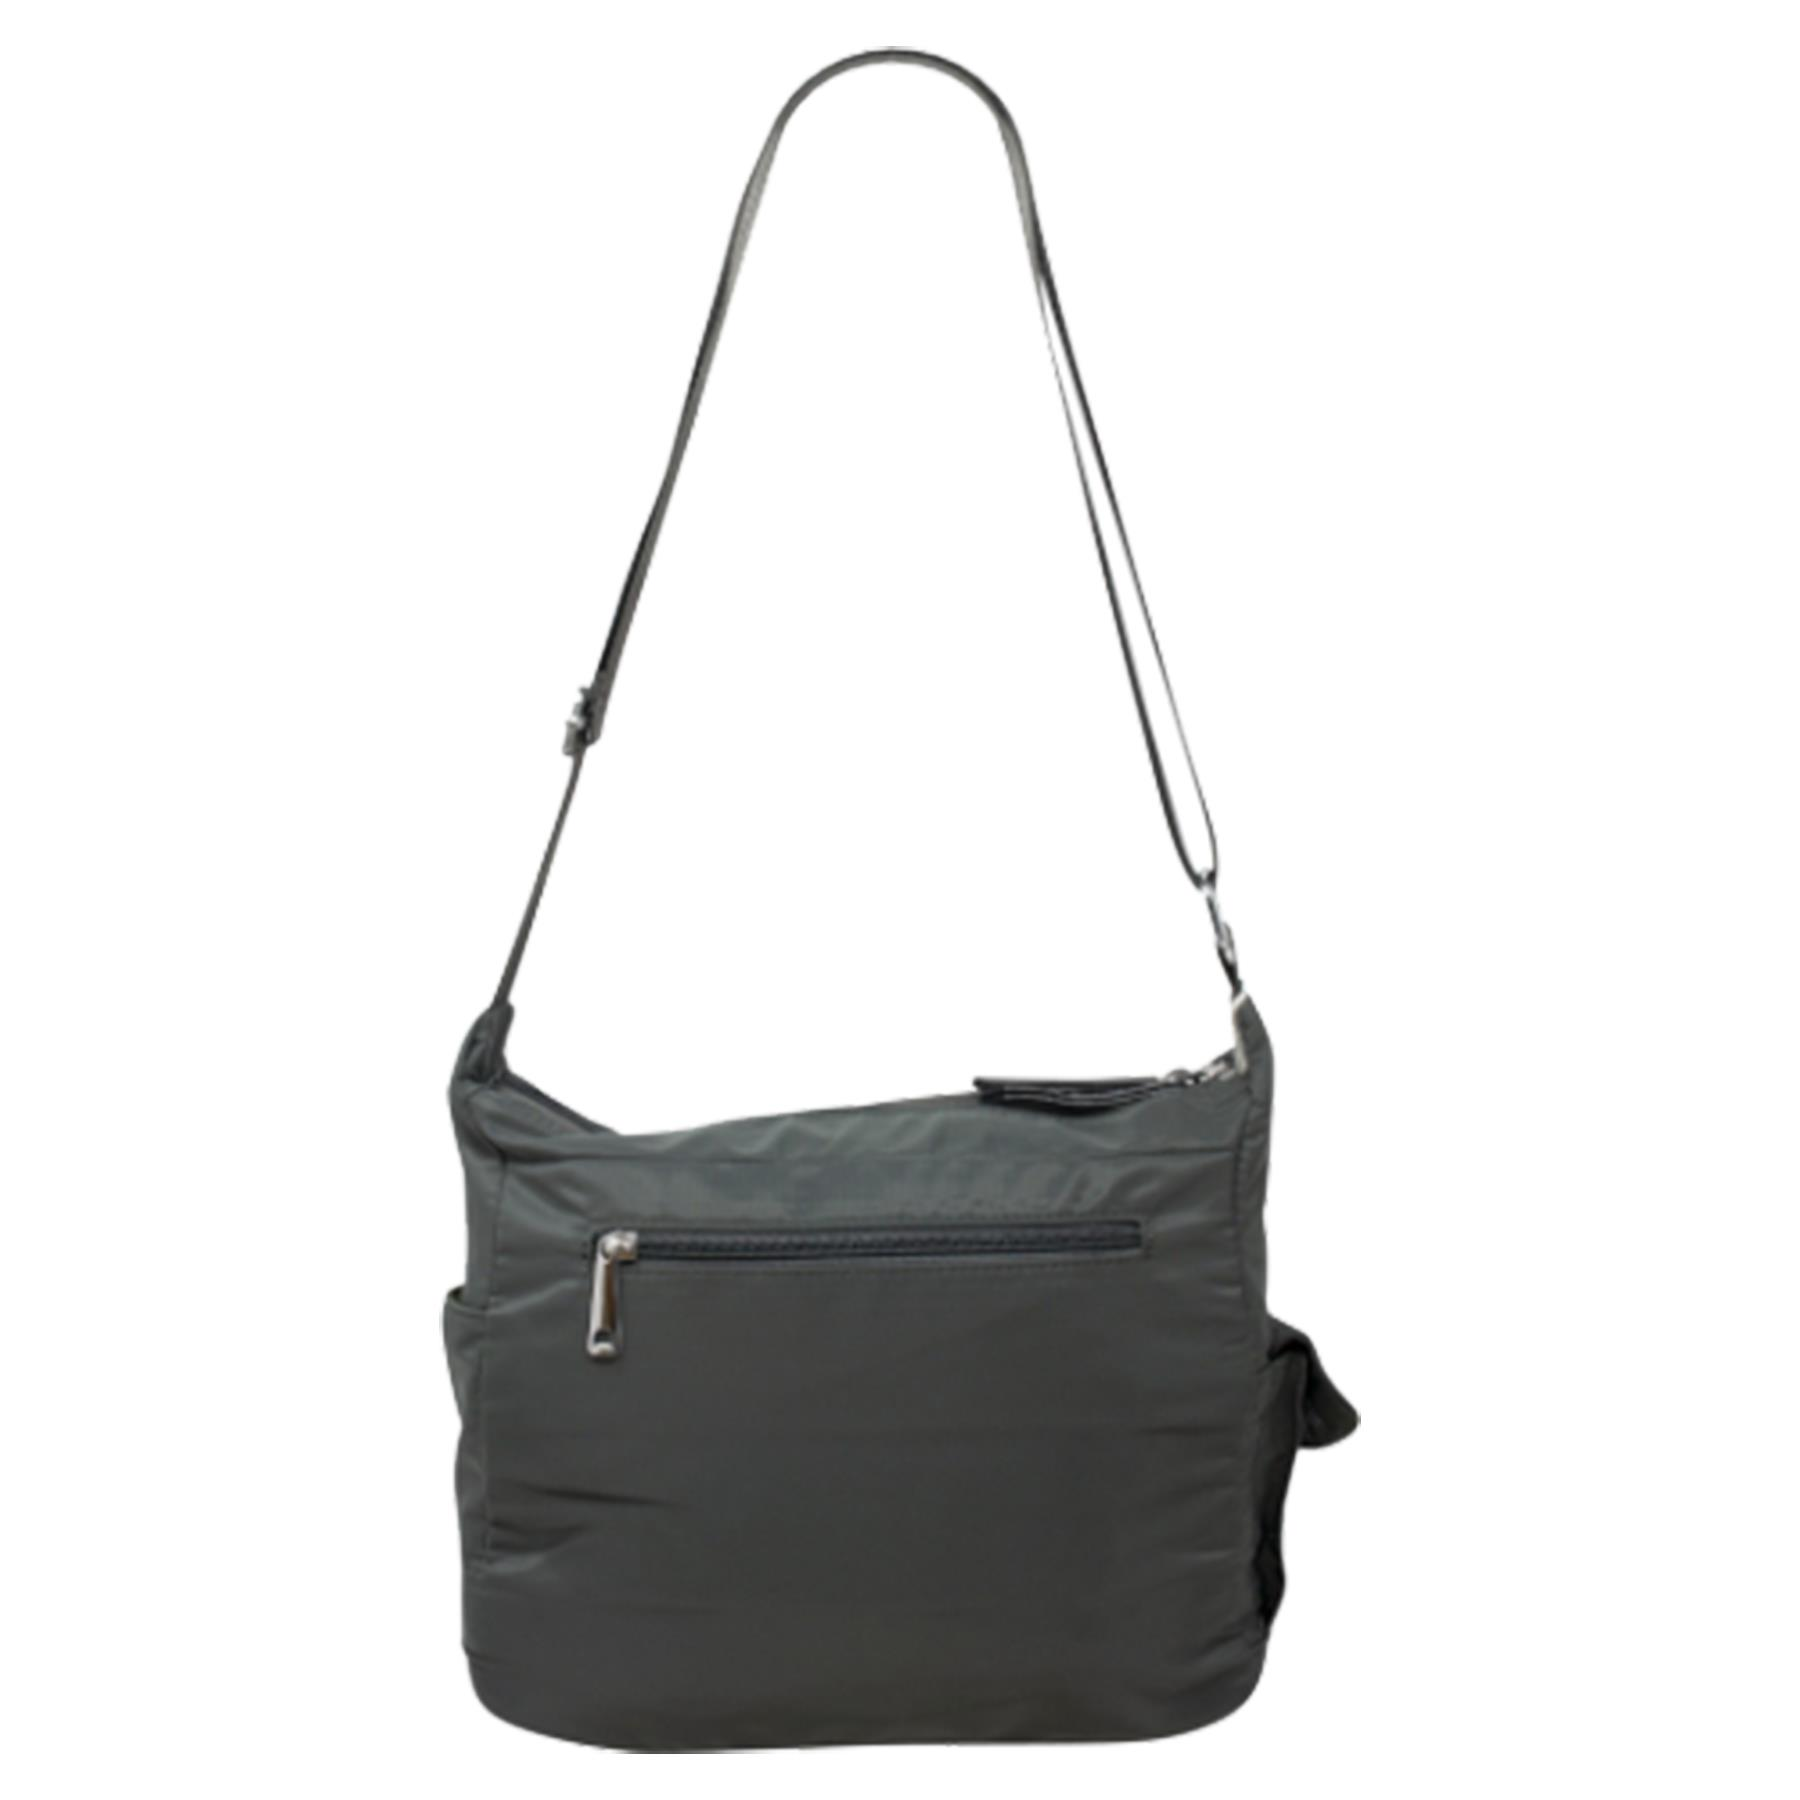 New-Ladies-Men-s-Showerproof-School-College-Practical-Basic-Crossbody-Bag thumbnail 25